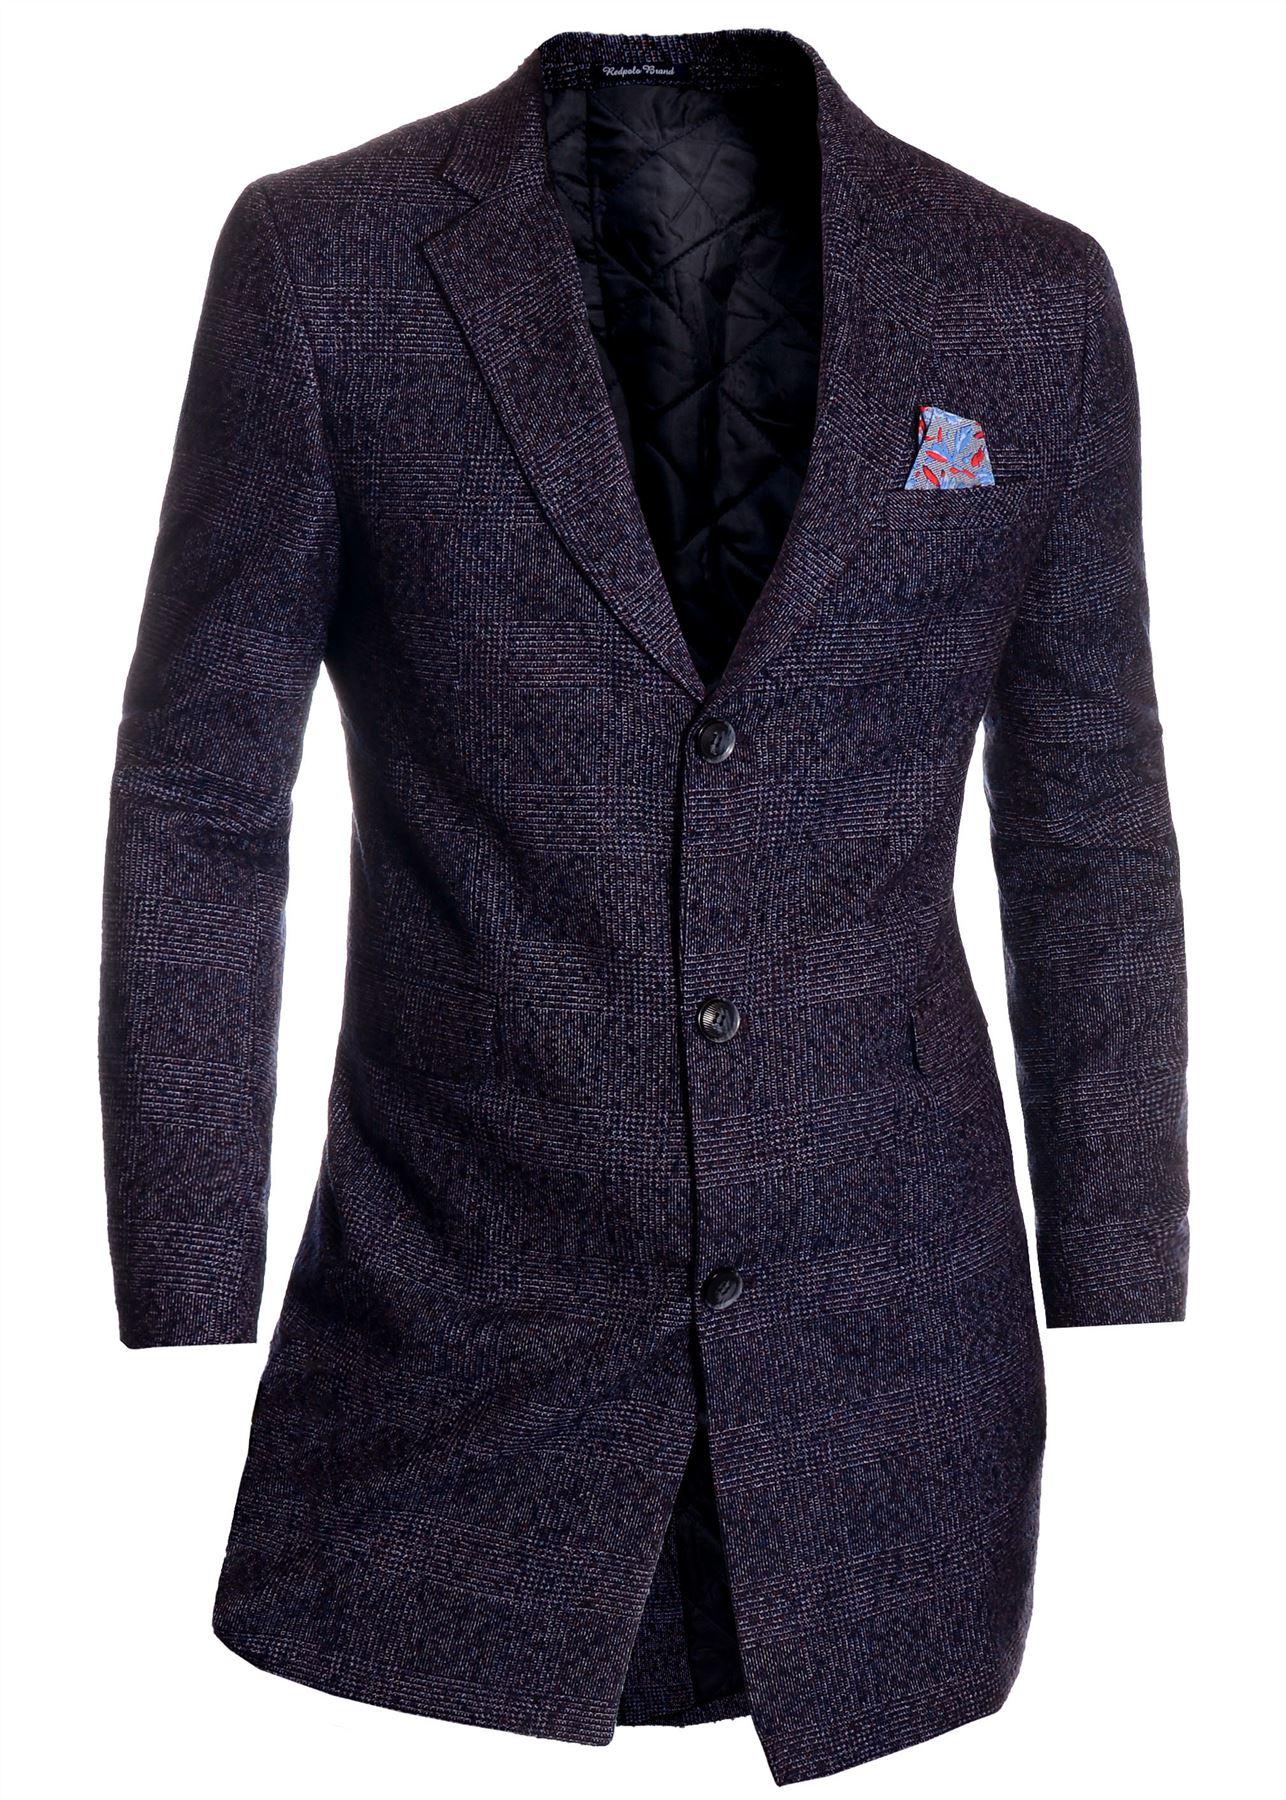 Men-039-s-Checkered-Coat-3-4-Long-Tweed-Cashmere-Wool-Trendy-Formal-Winter-Overcoat thumbnail 18